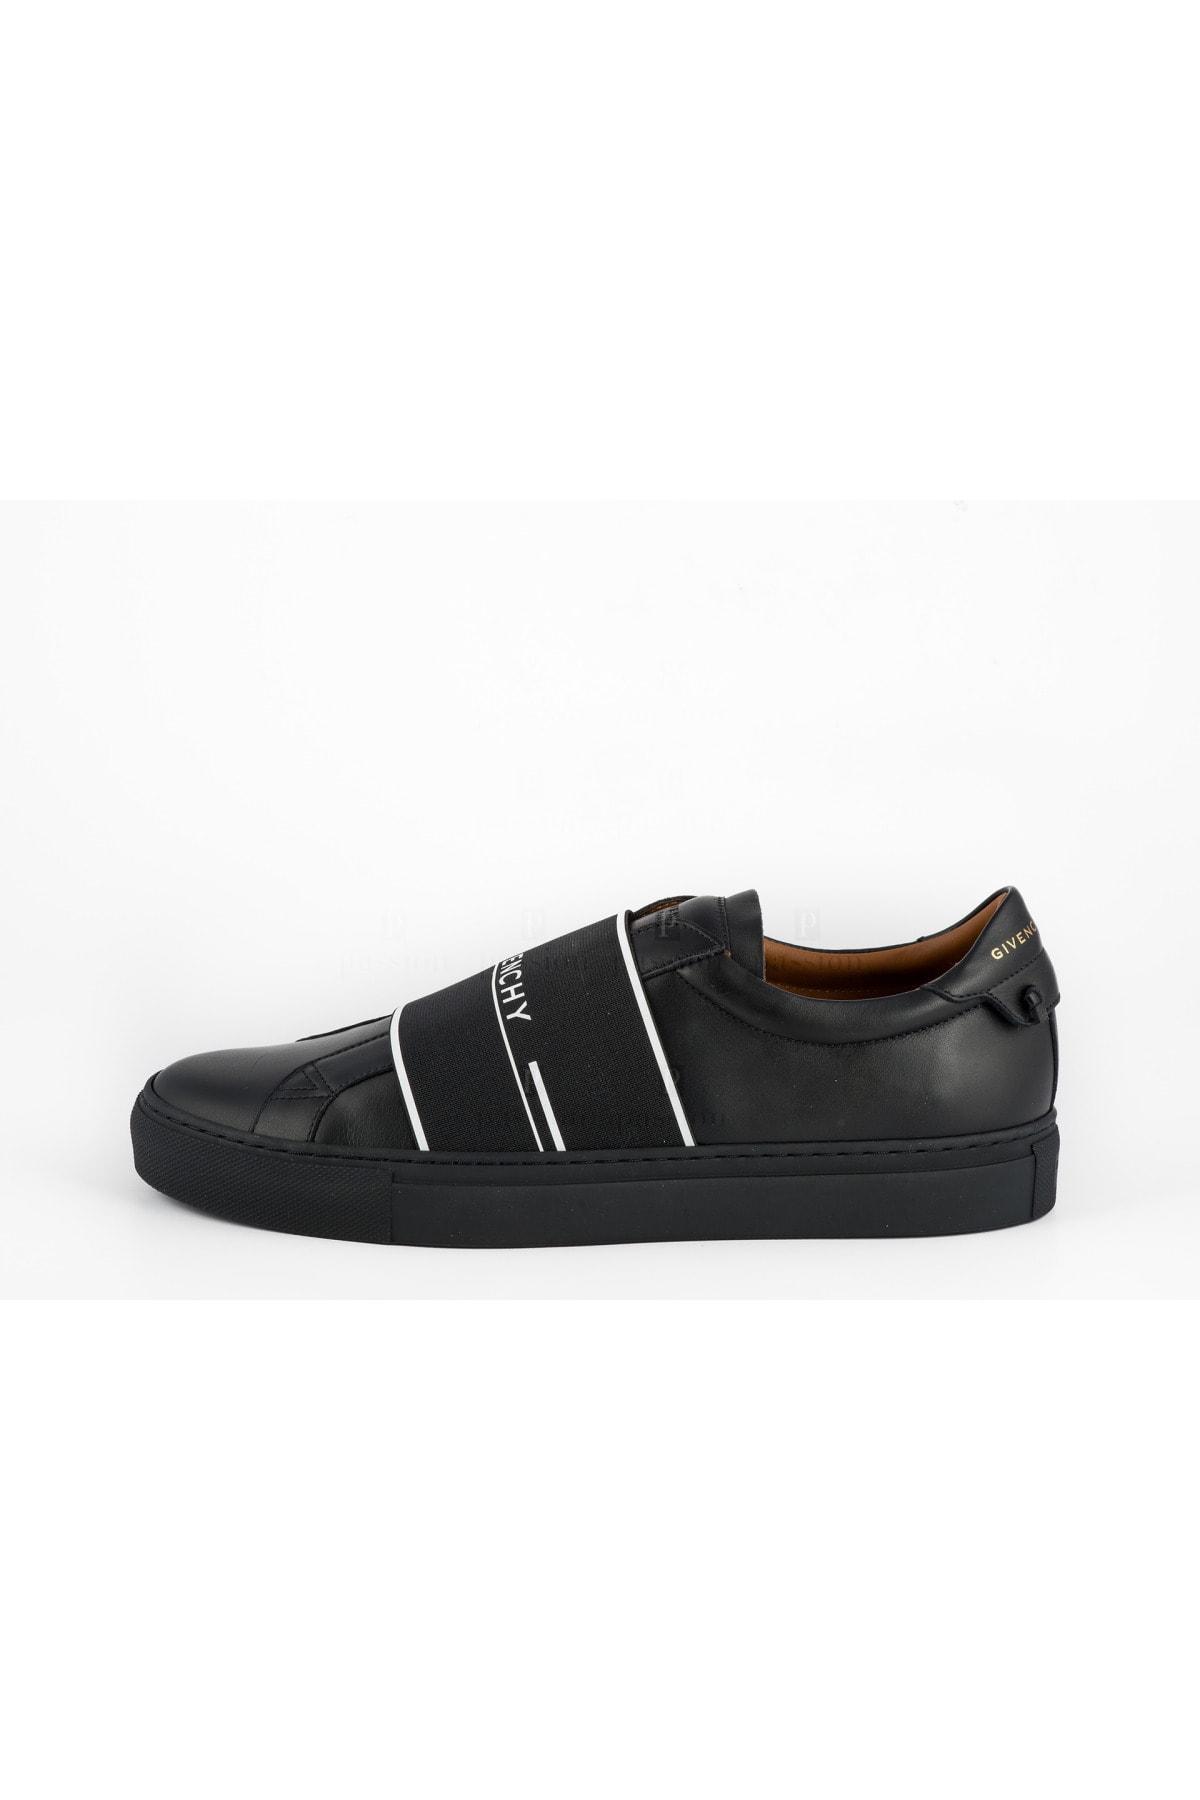 Givenchy Erkek Siyah Deri Sneaker 2